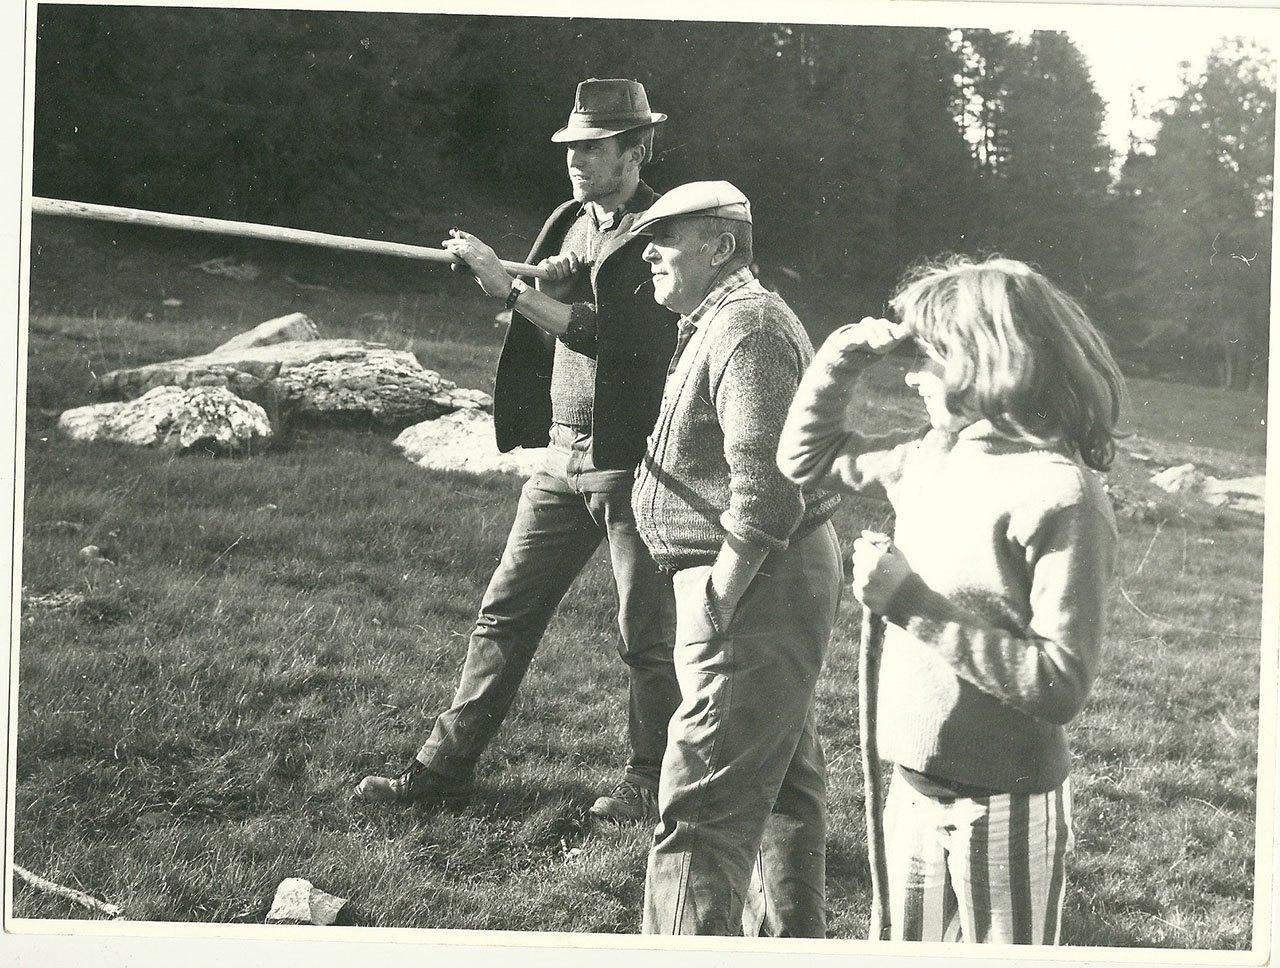 1976-reotier-berger-et-augustin